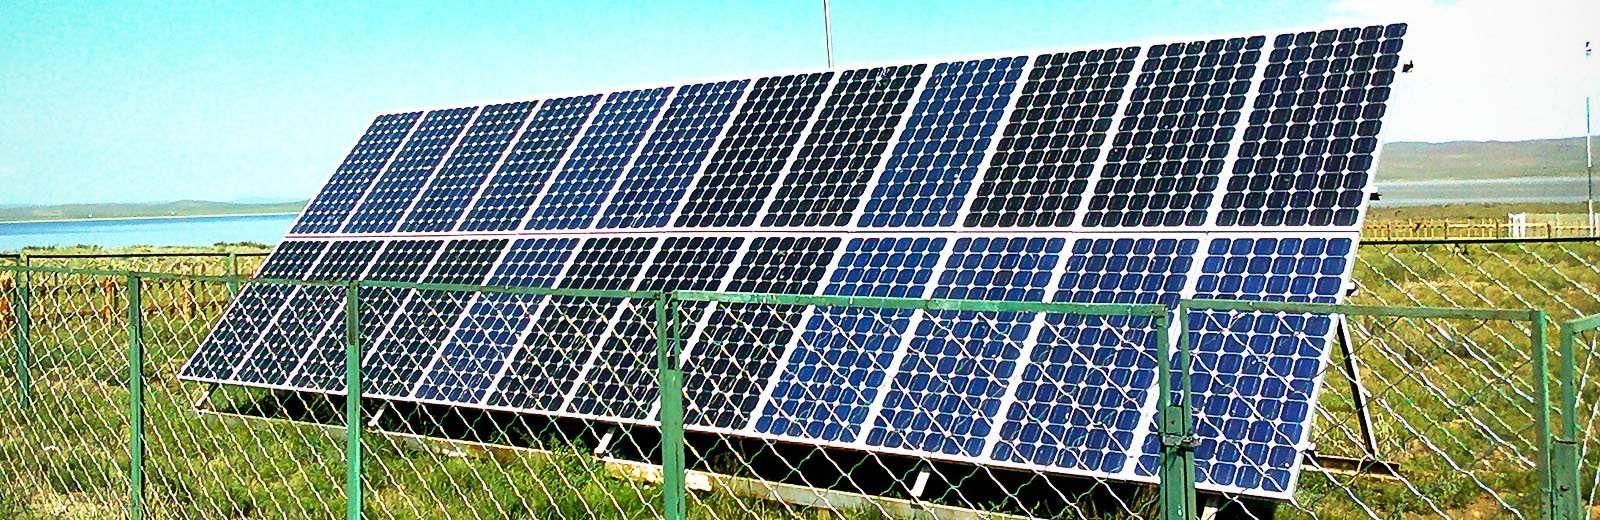 12 Best DIY Solar Panel Tutorials For The Frugal Homesteader